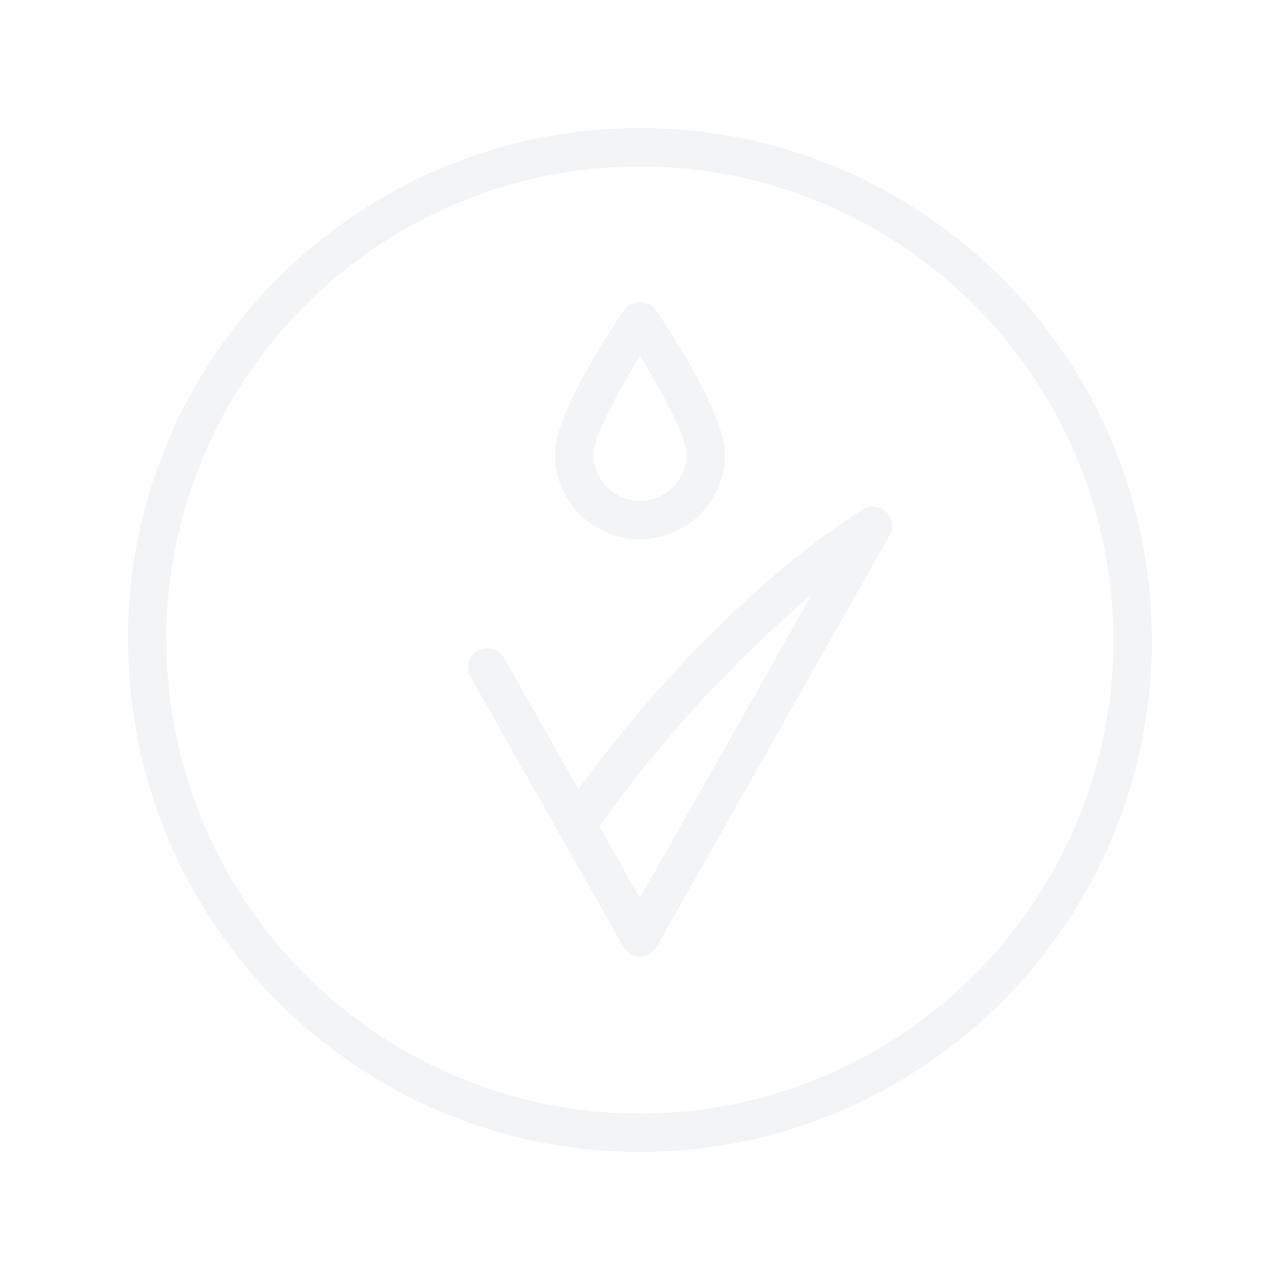 E.L.F. Aqua Beauty Primer Mist Clear 30ml